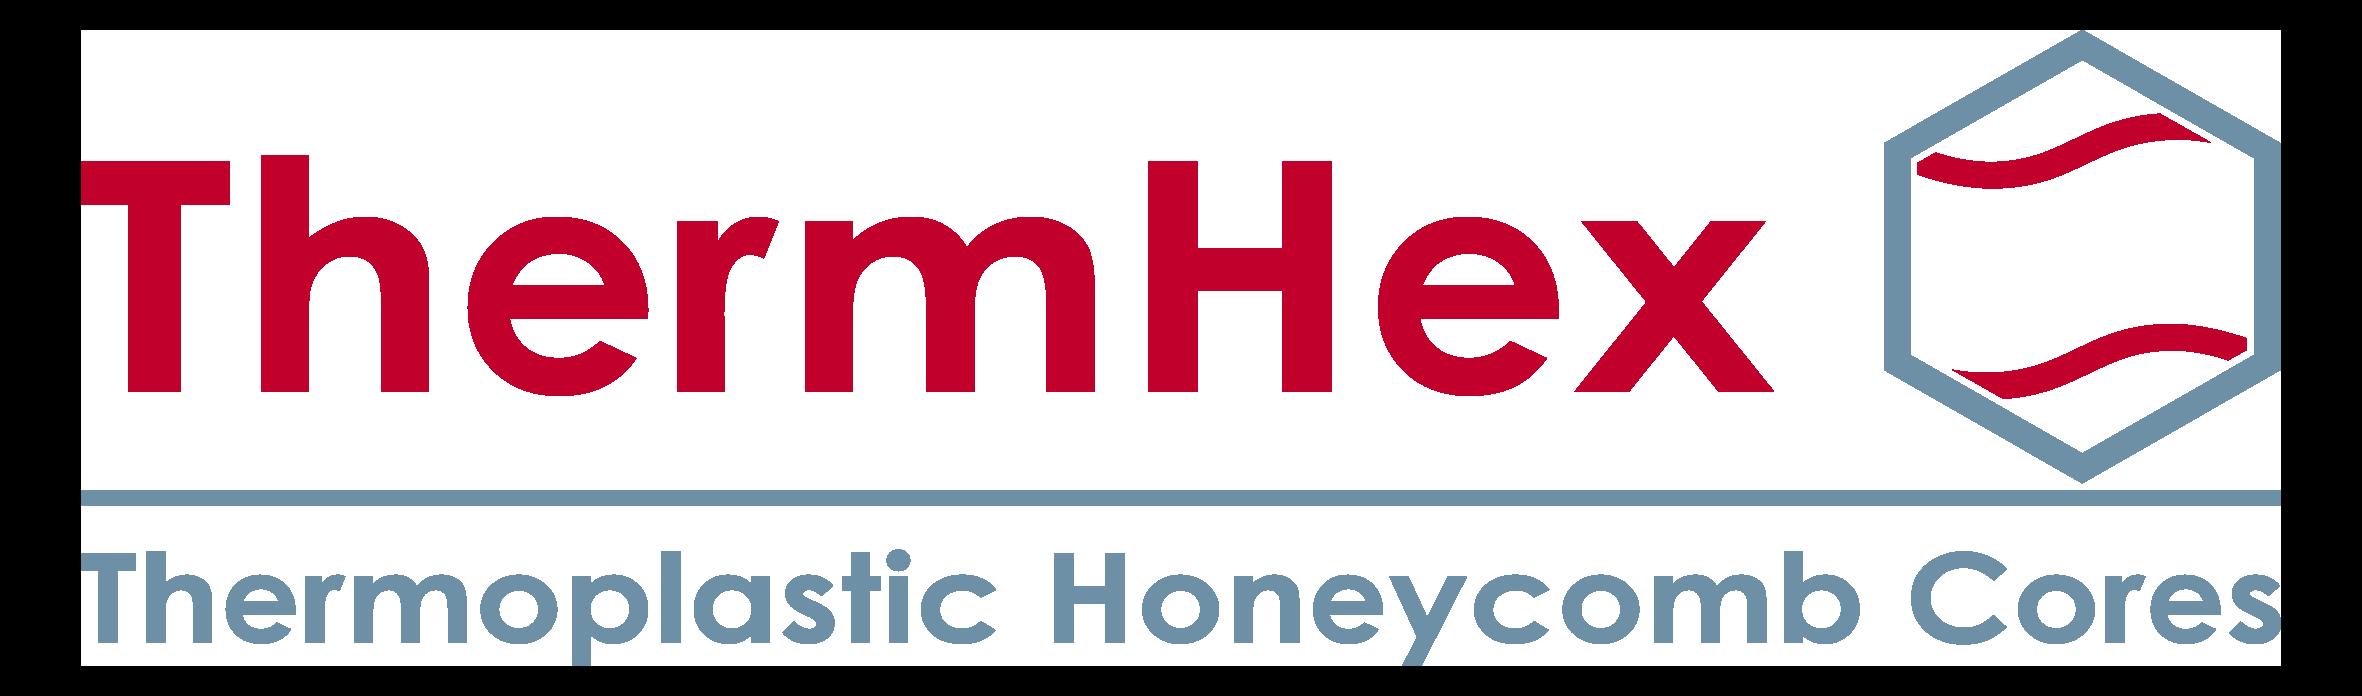 thermhex-logo